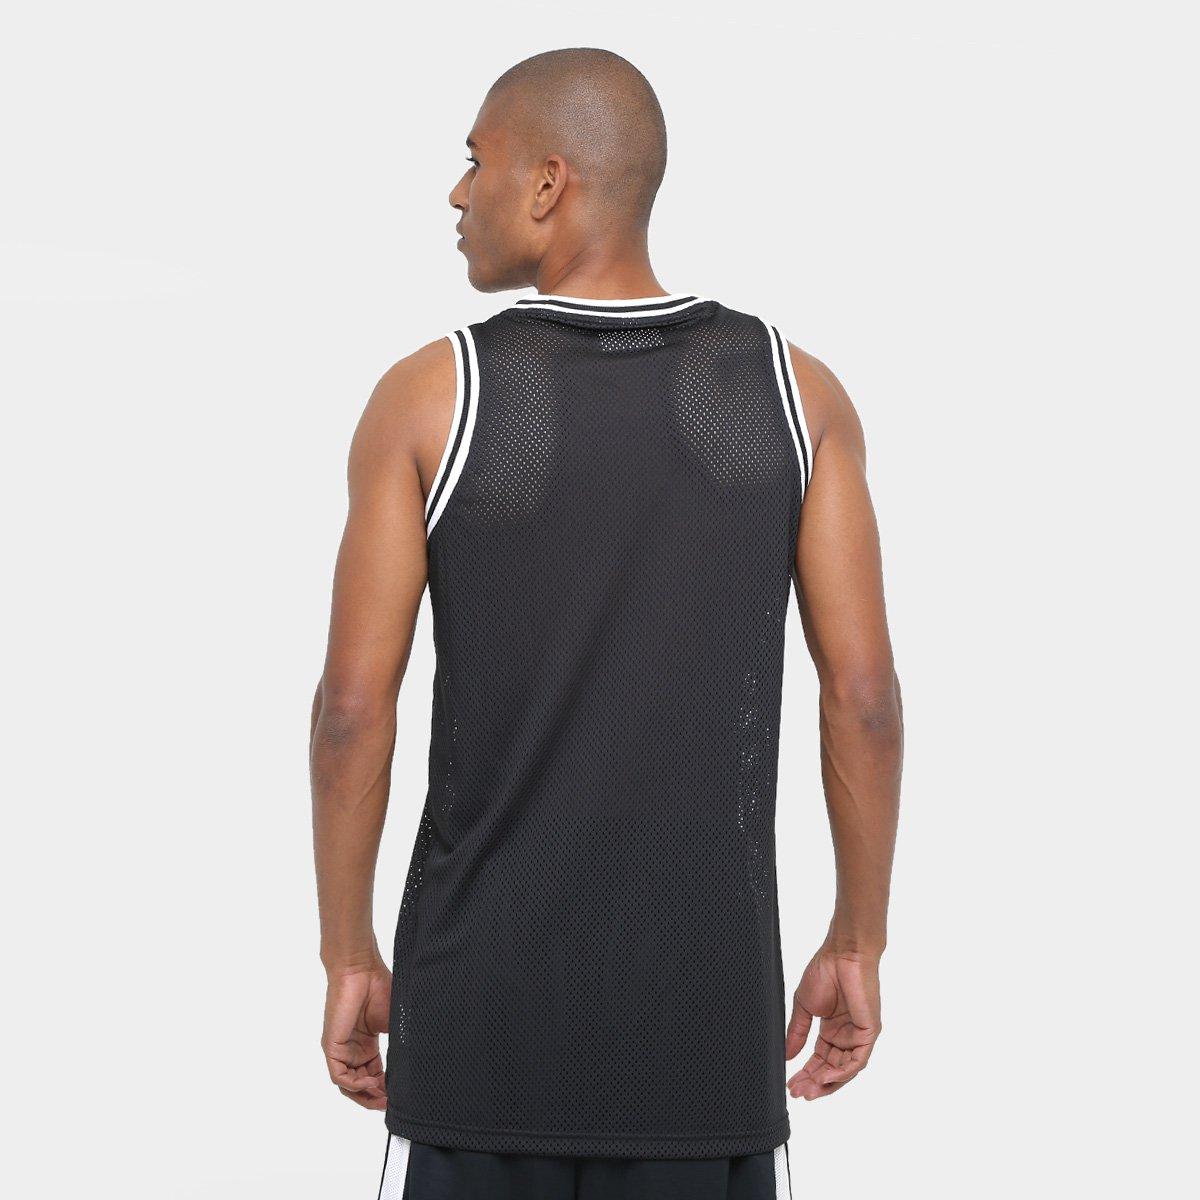 Camiseta Regata NBA Brooklyn Nets New Era Jersey Game Masculina ... 6cfb416a72f